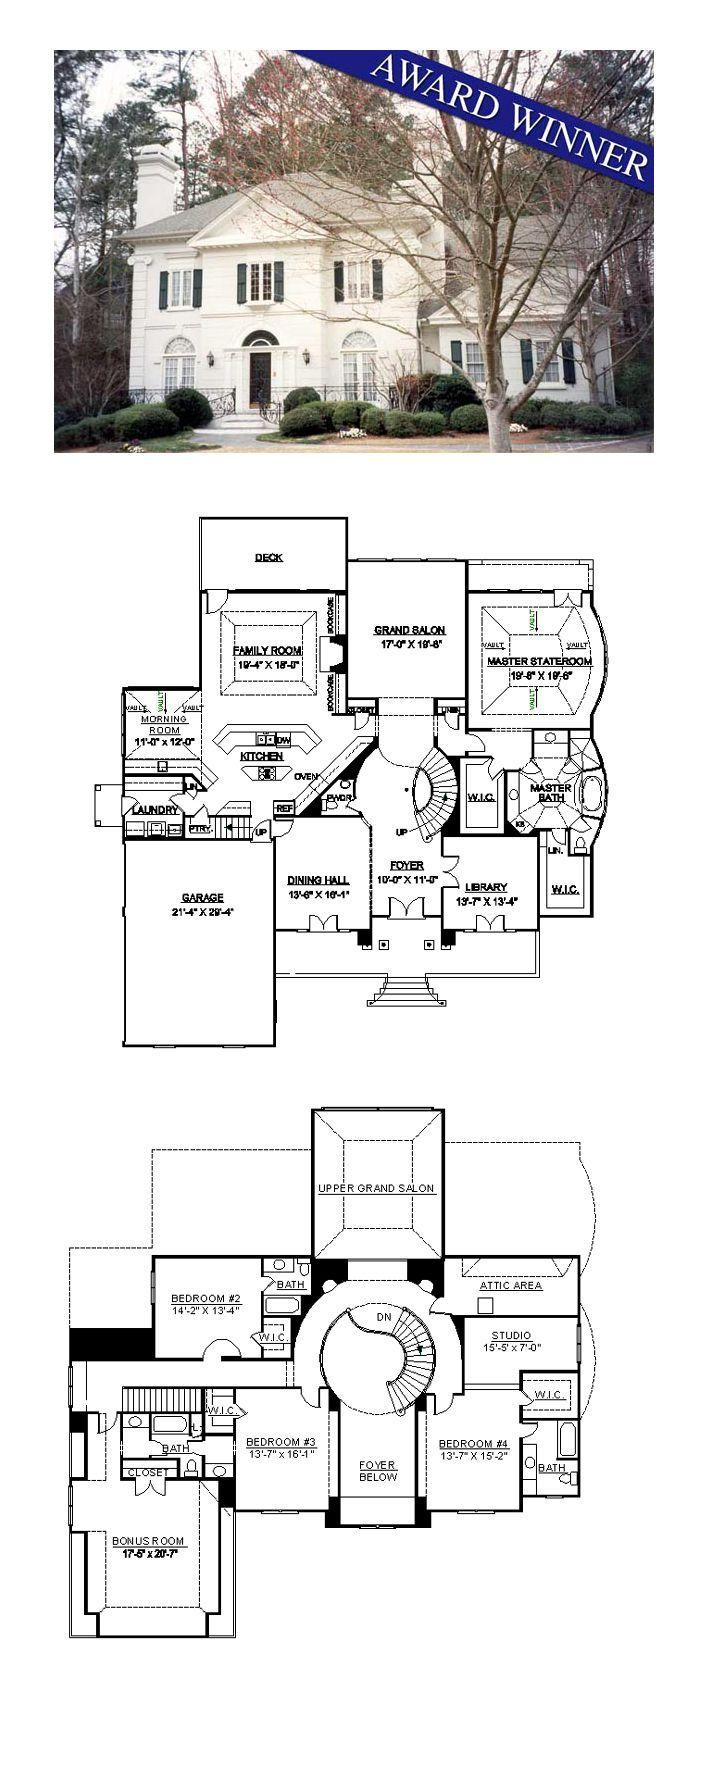 Greek Revival House Plan 98252 Total Living Area 4364 Sq Ft 4 Bedrooms And 4 5 Bathrooms Greekrevivalho House Blueprints Greek Revival Home House Plans